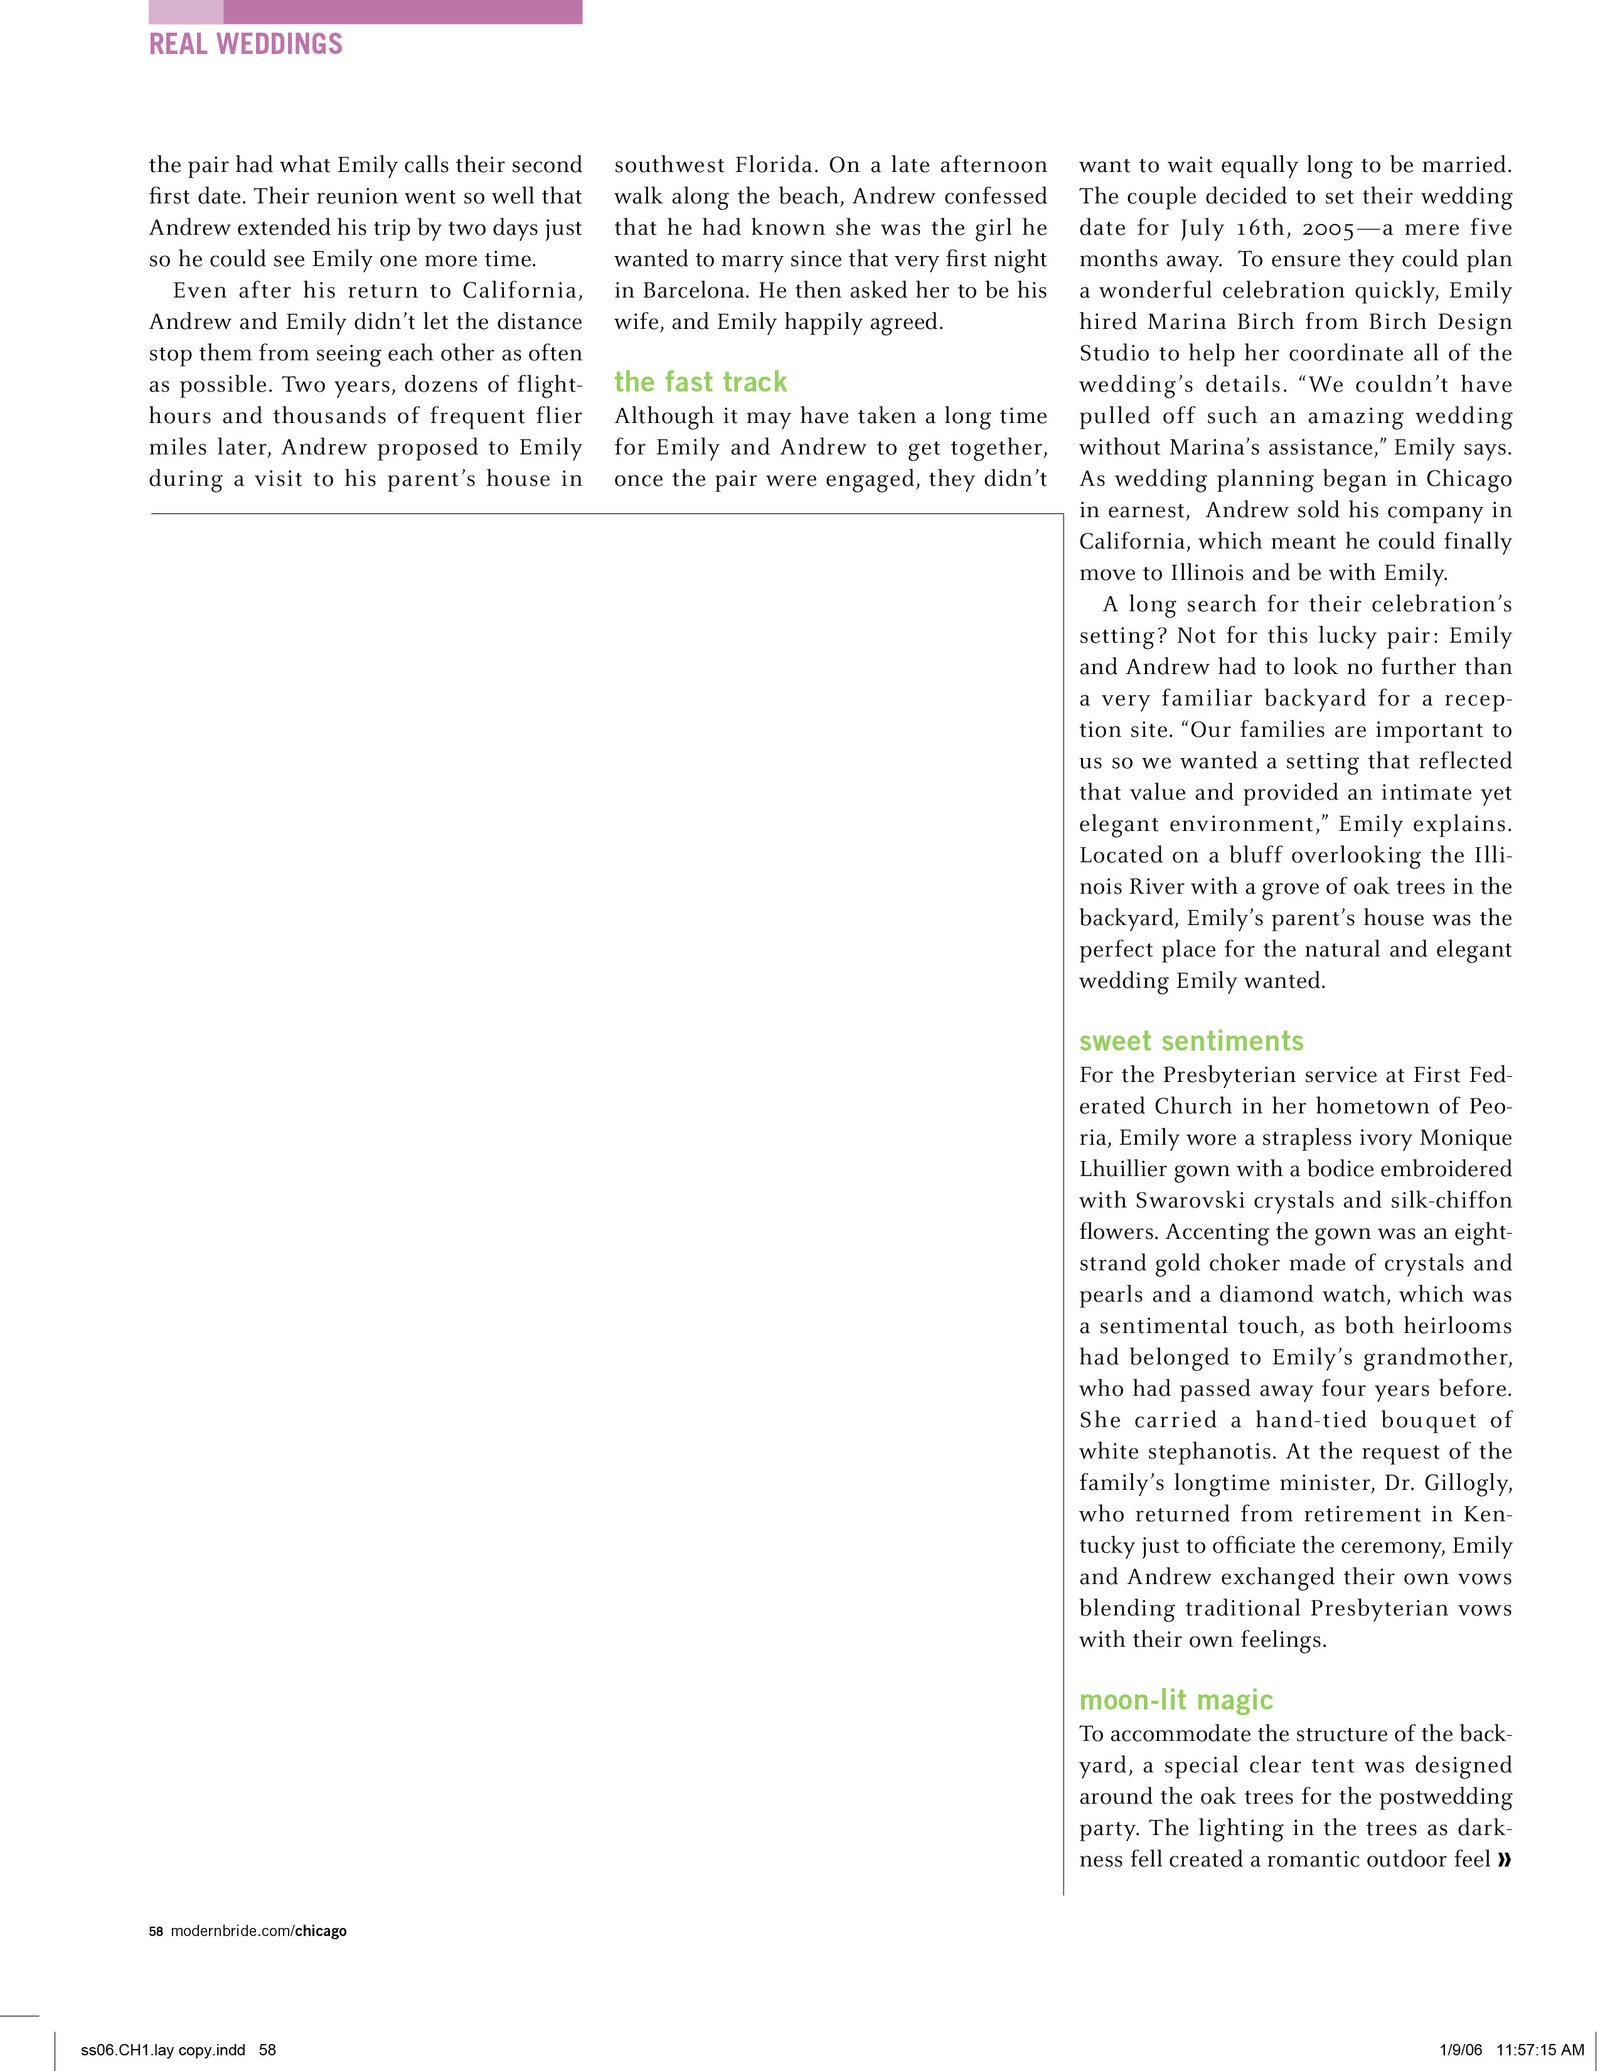 54 - Modern Bride Chicago - Article-2